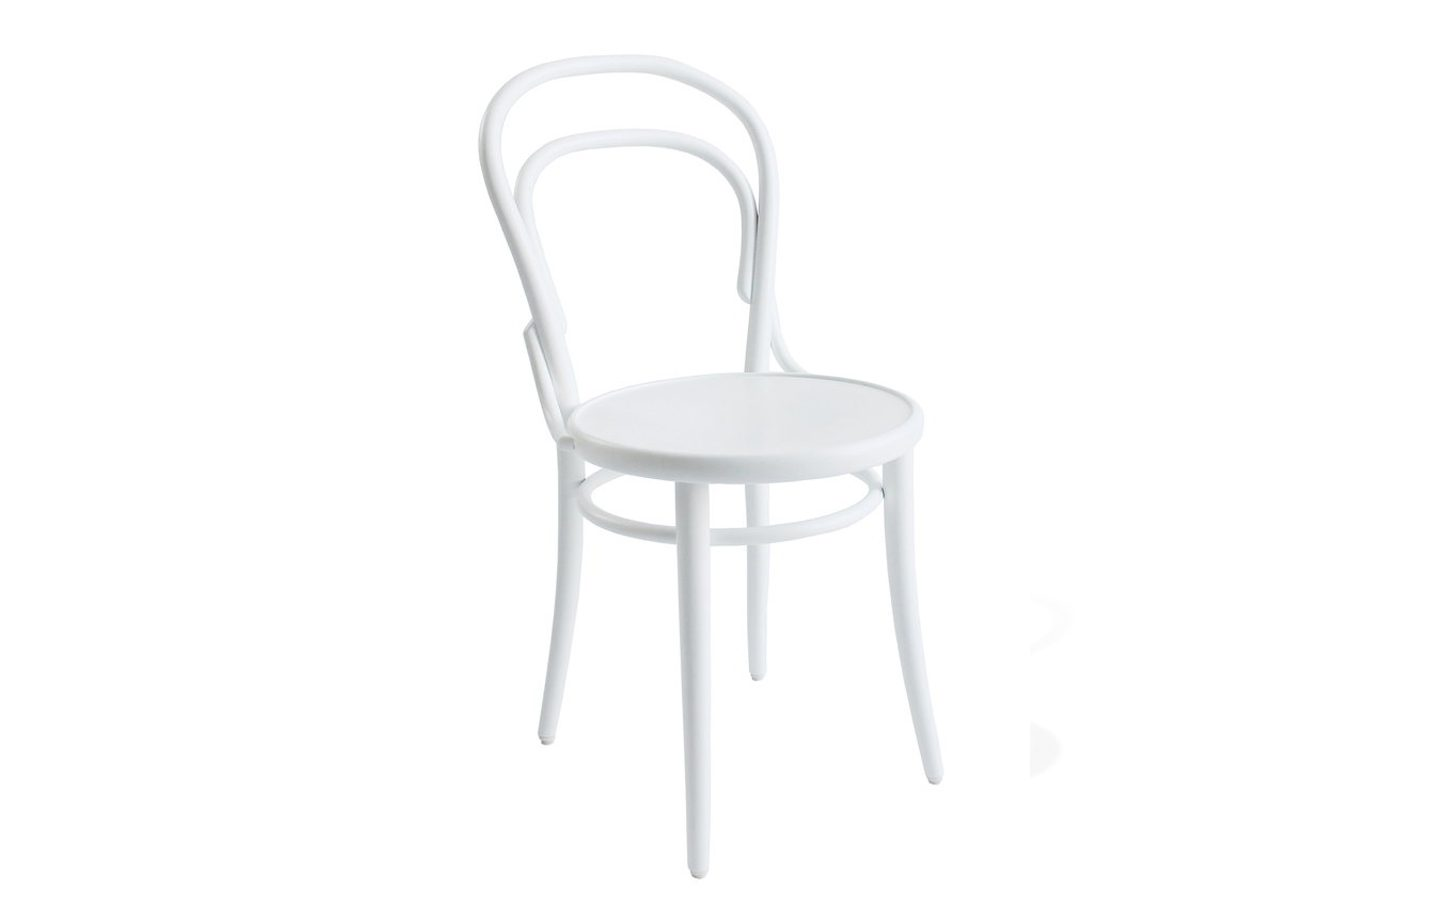 14-dining-chair-bent-wood-Ton-05